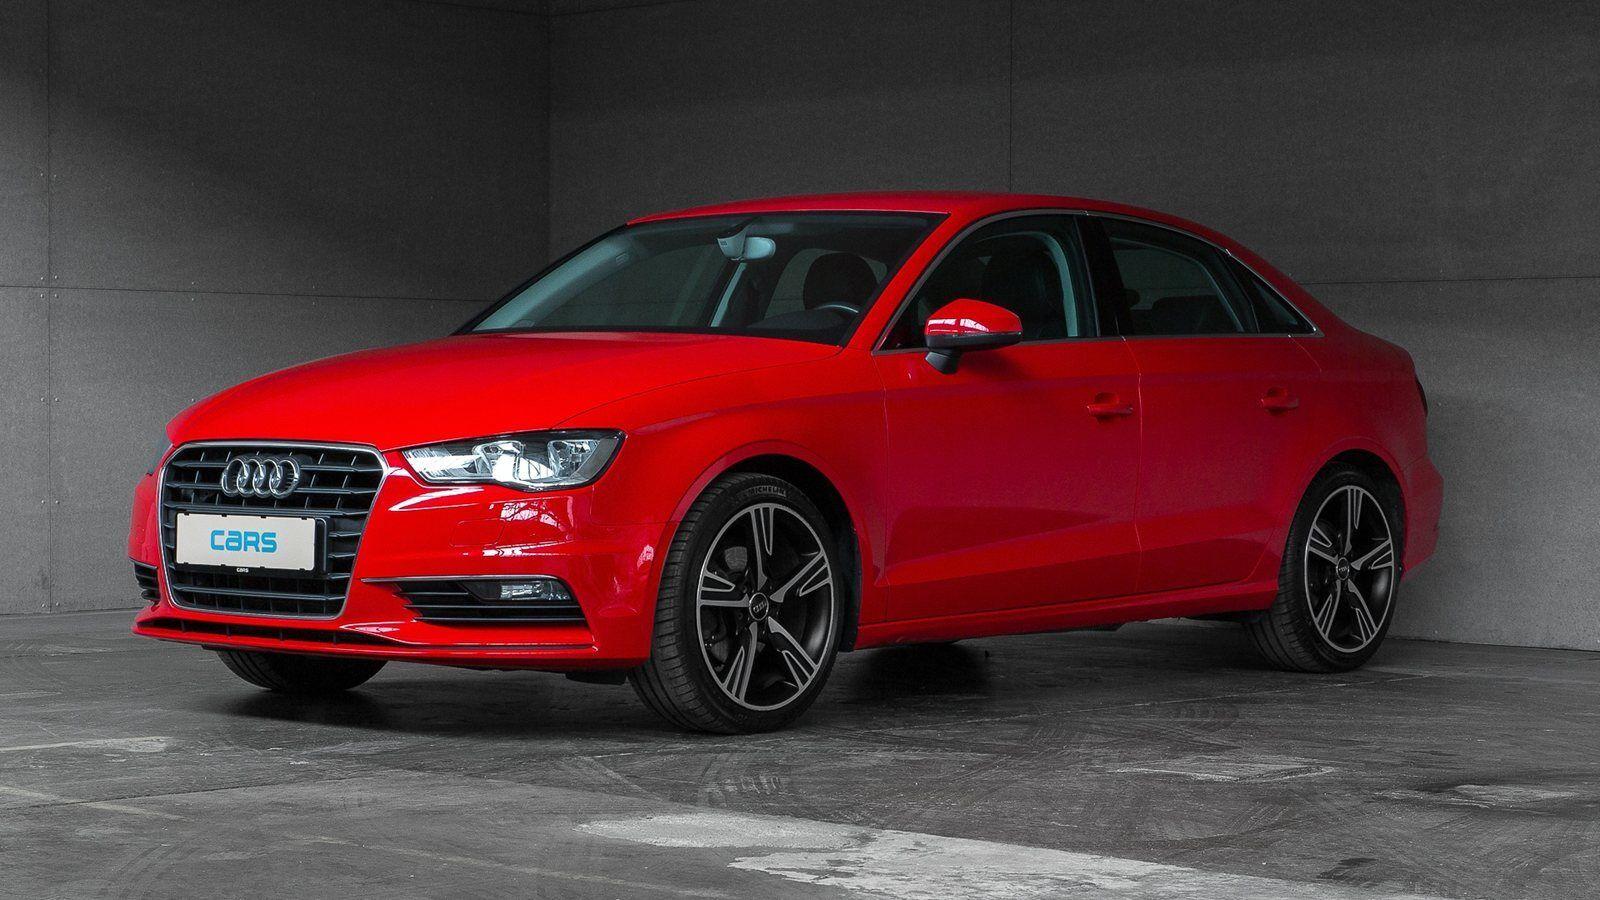 Audi A3 2,0 TDi 150 Ambition 4d - 199.700 kr.